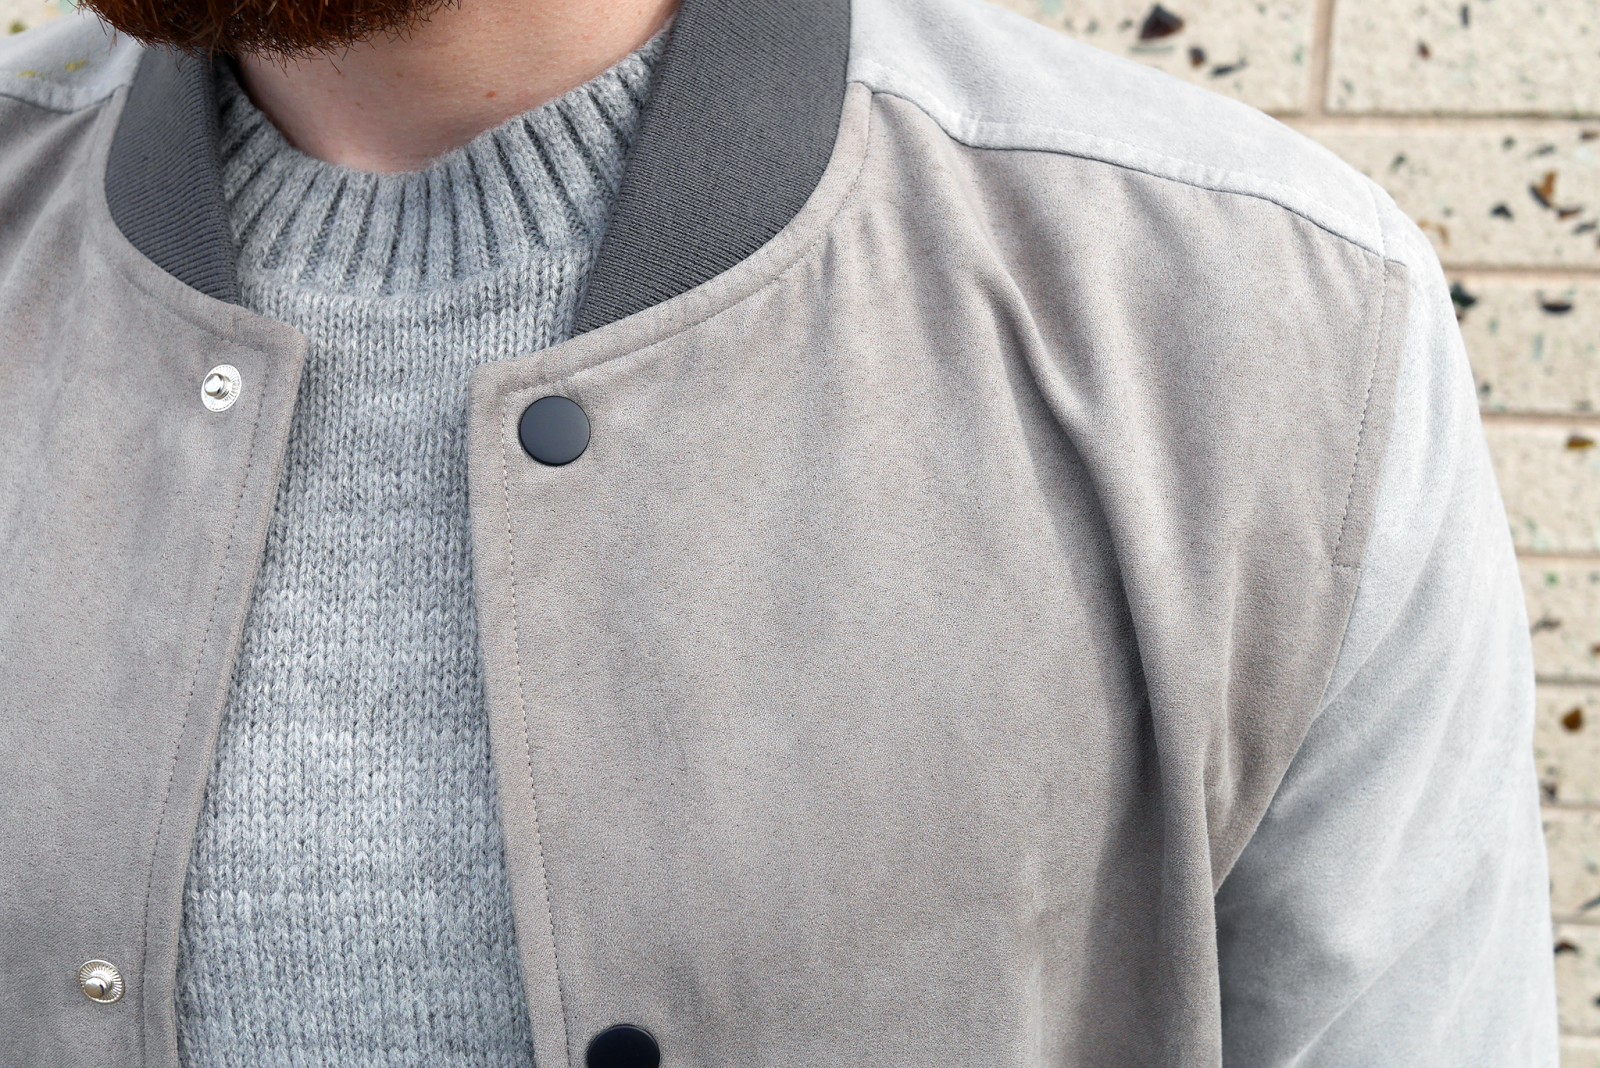 Shirt design new look - Russ Wears New Look Men Stone Bomber Jacket Grey Jumper Khaki Chinos Grey Sneakers Socks By Form Thread